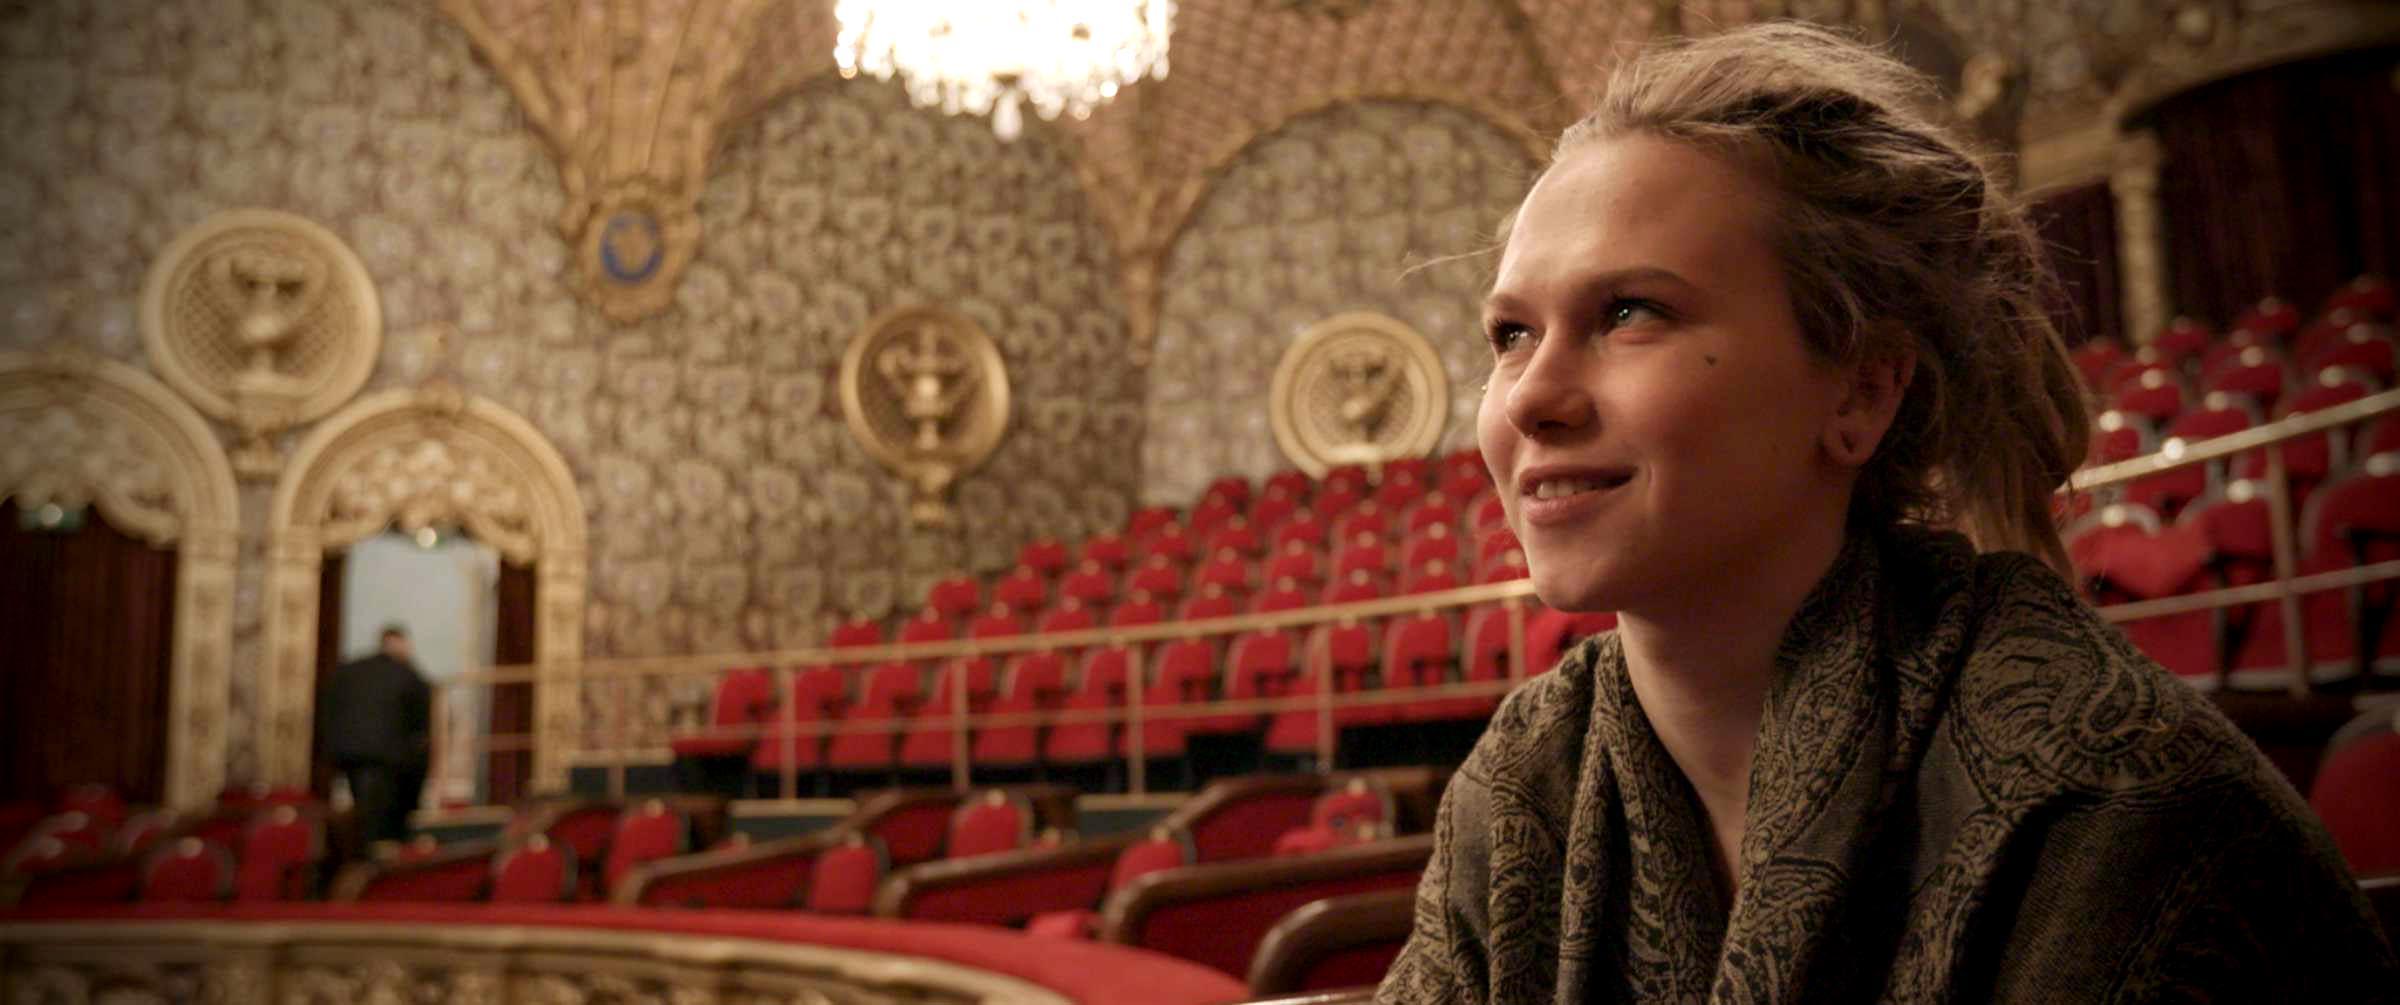 LMTA Balkono teatre – nemokami renginiai | rengėjų nuotr.